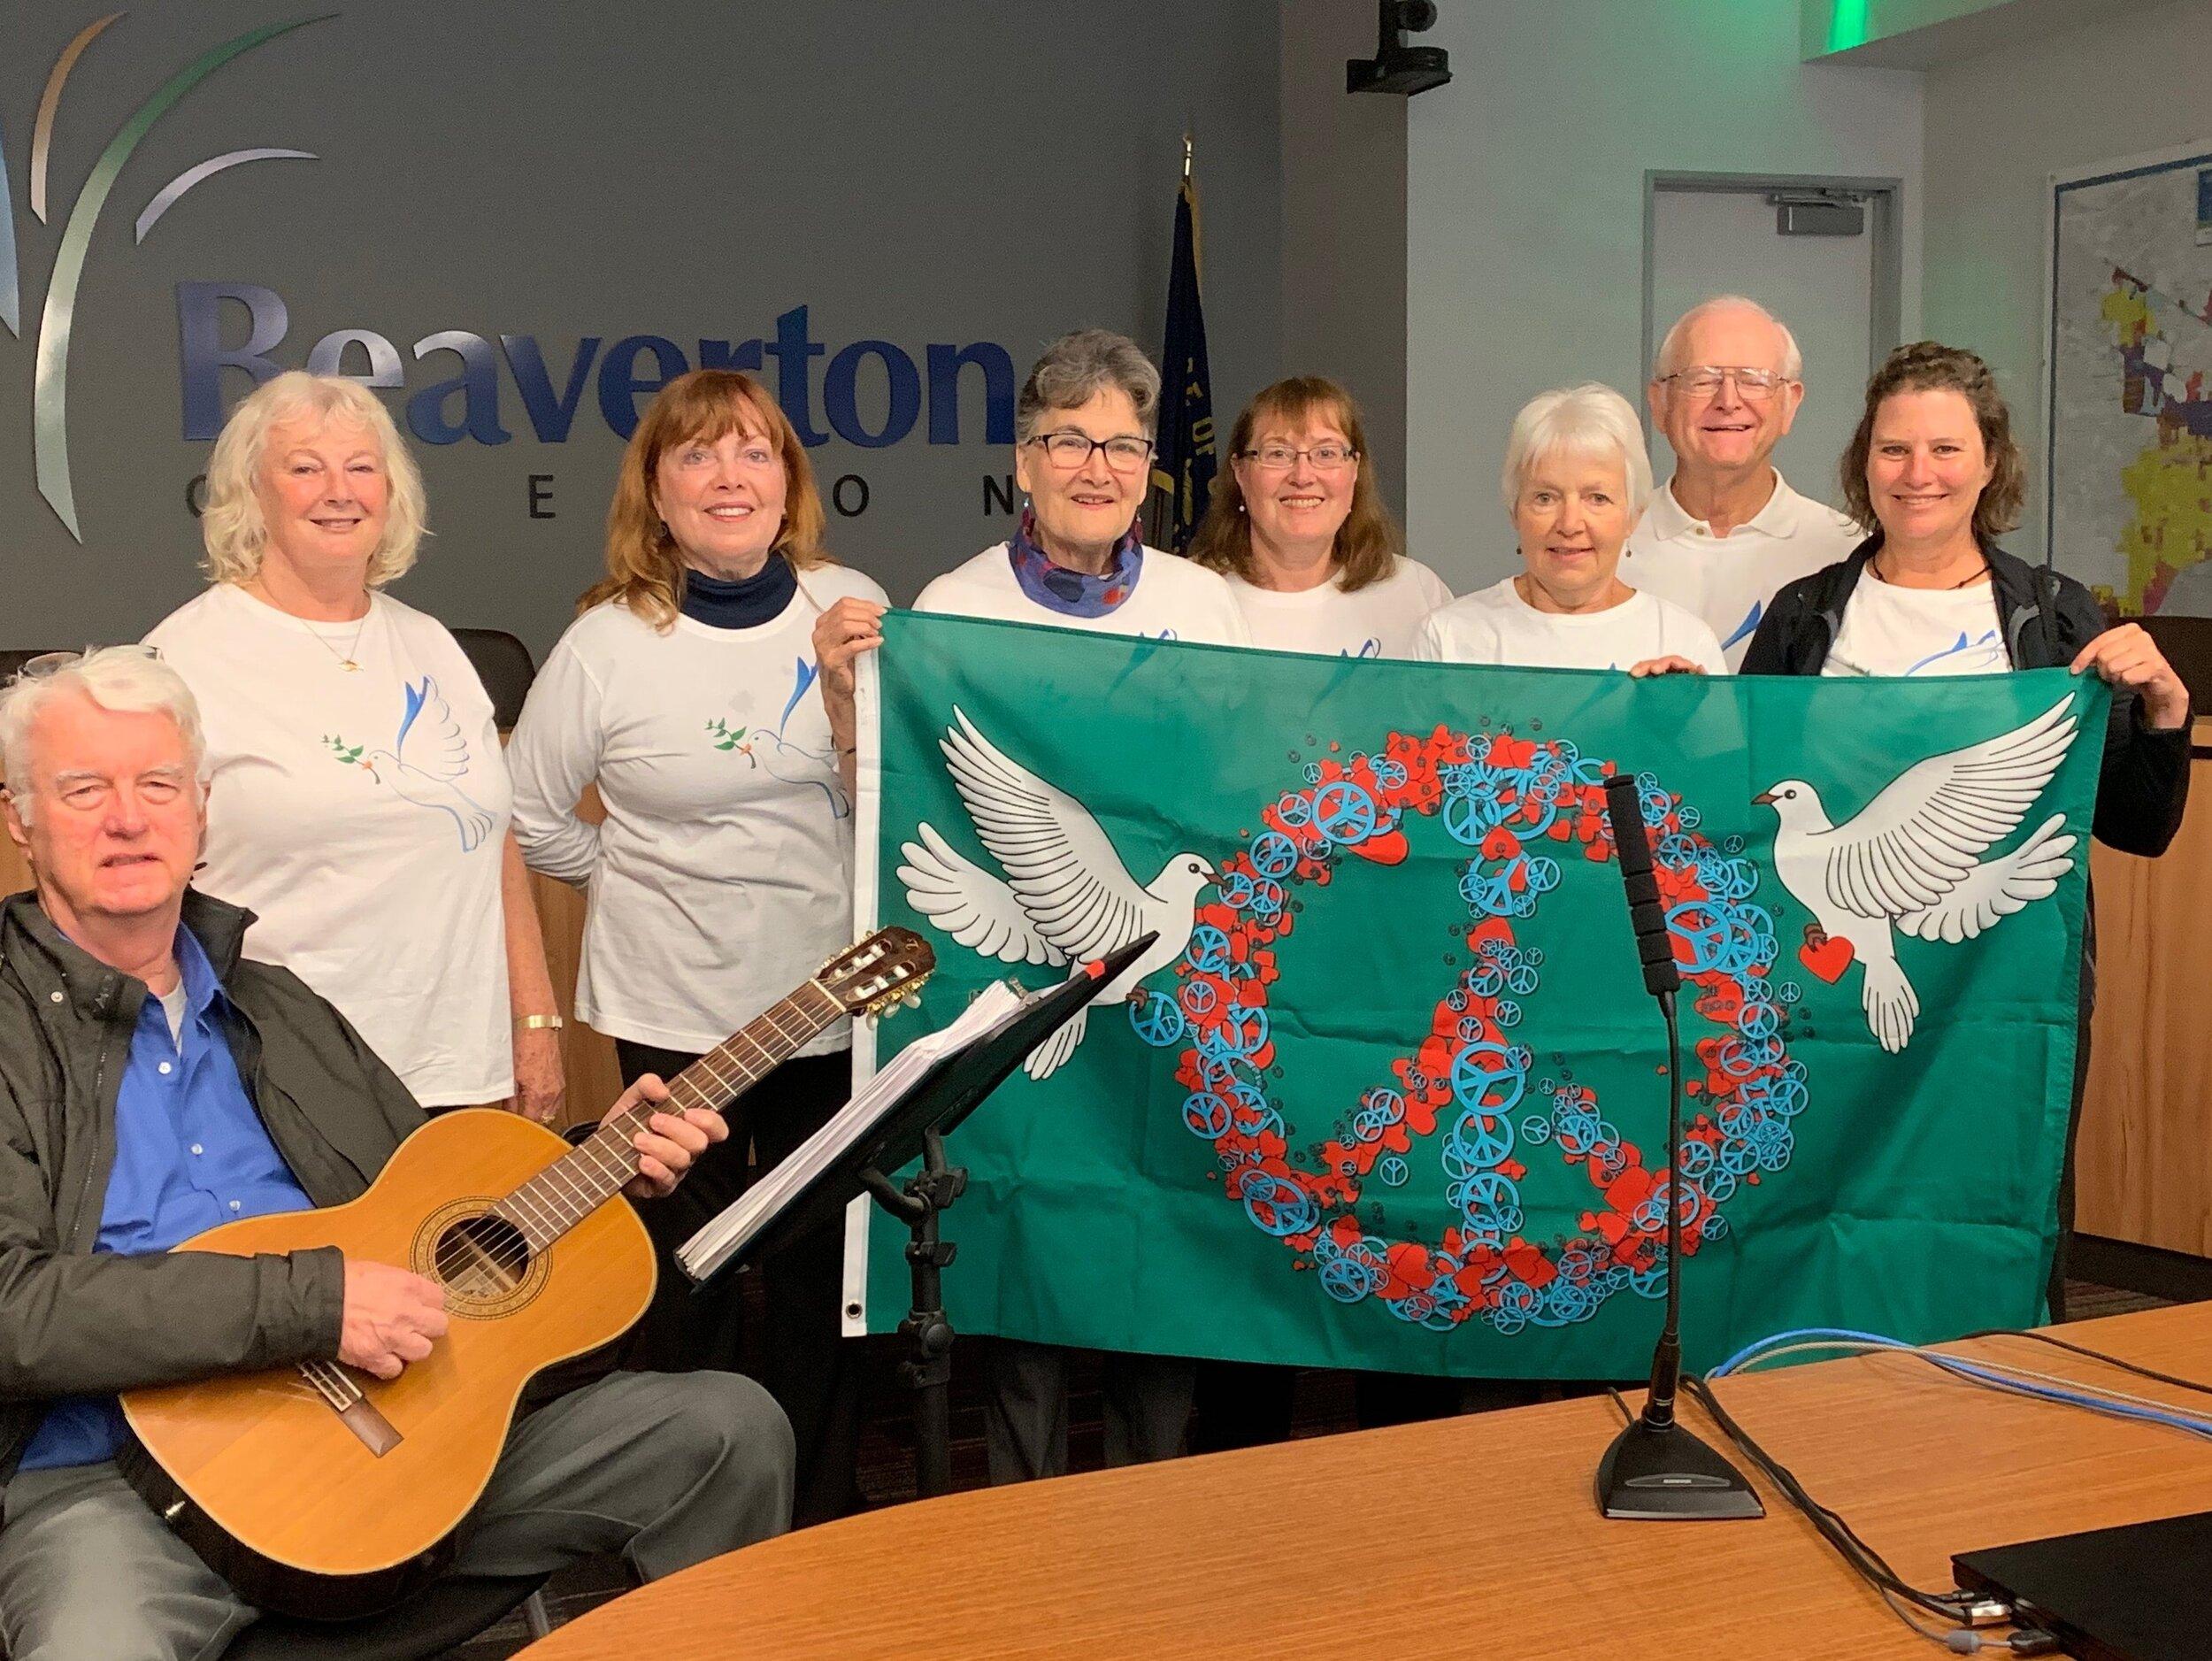 Beaverton City Hall Peace Pole Dedication. Photo by Maureen Wheeler.